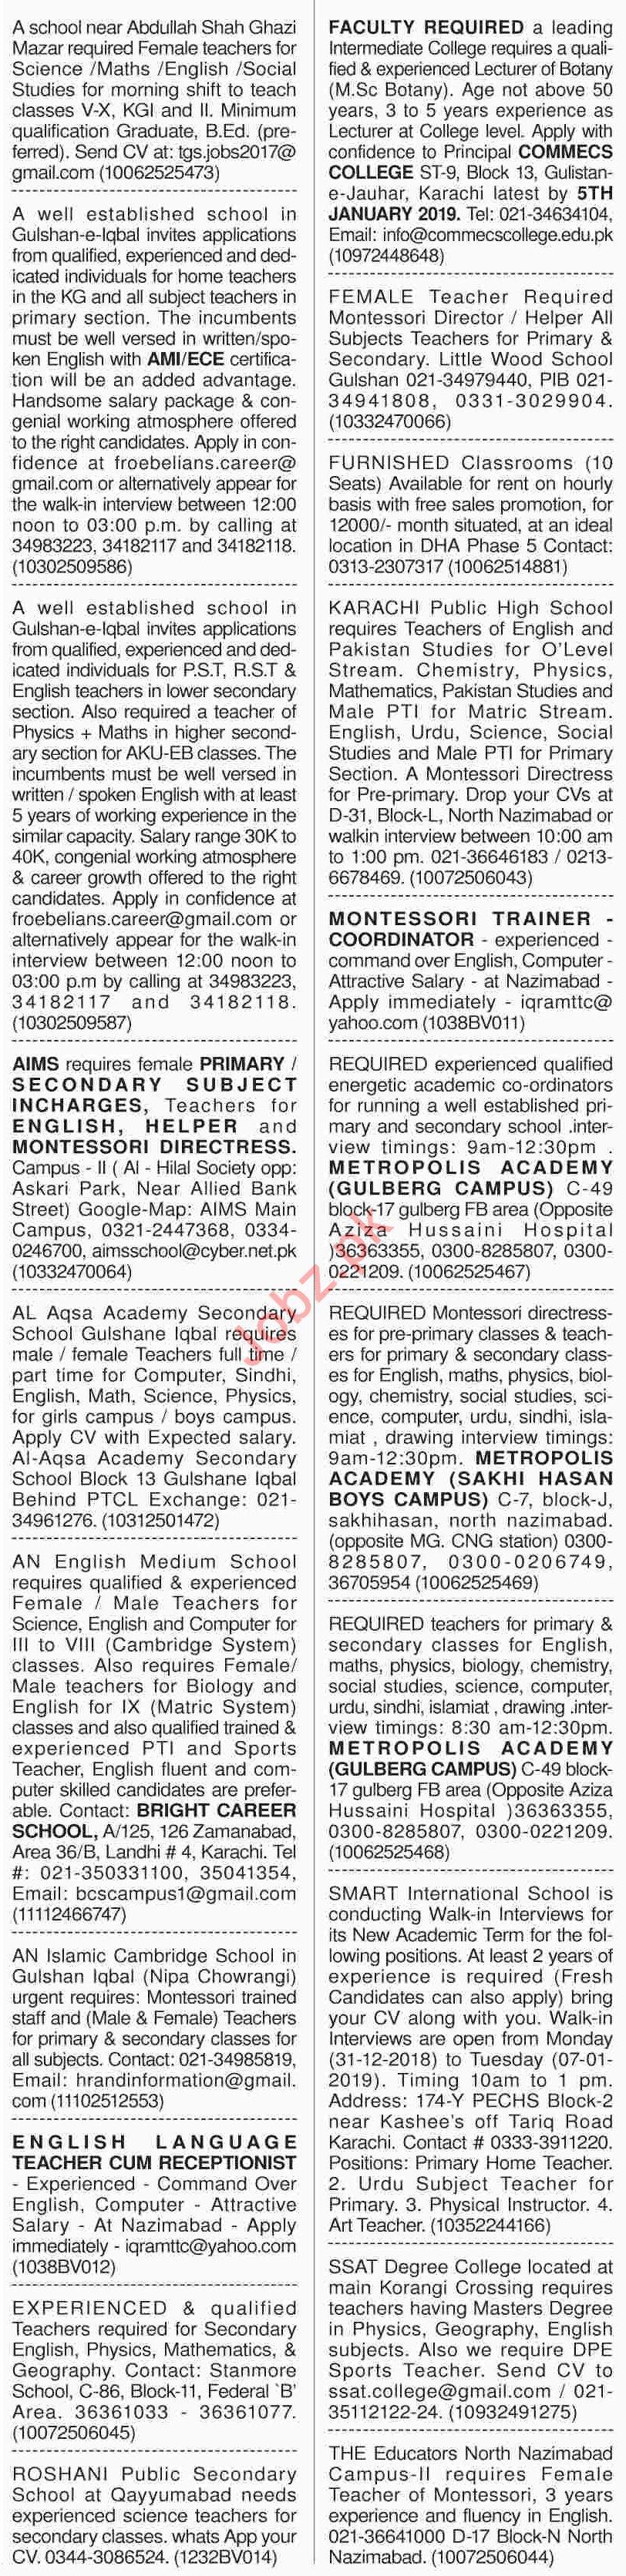 Dawn Sunday Newspaper Teachers Classified Ads 30/12/2018